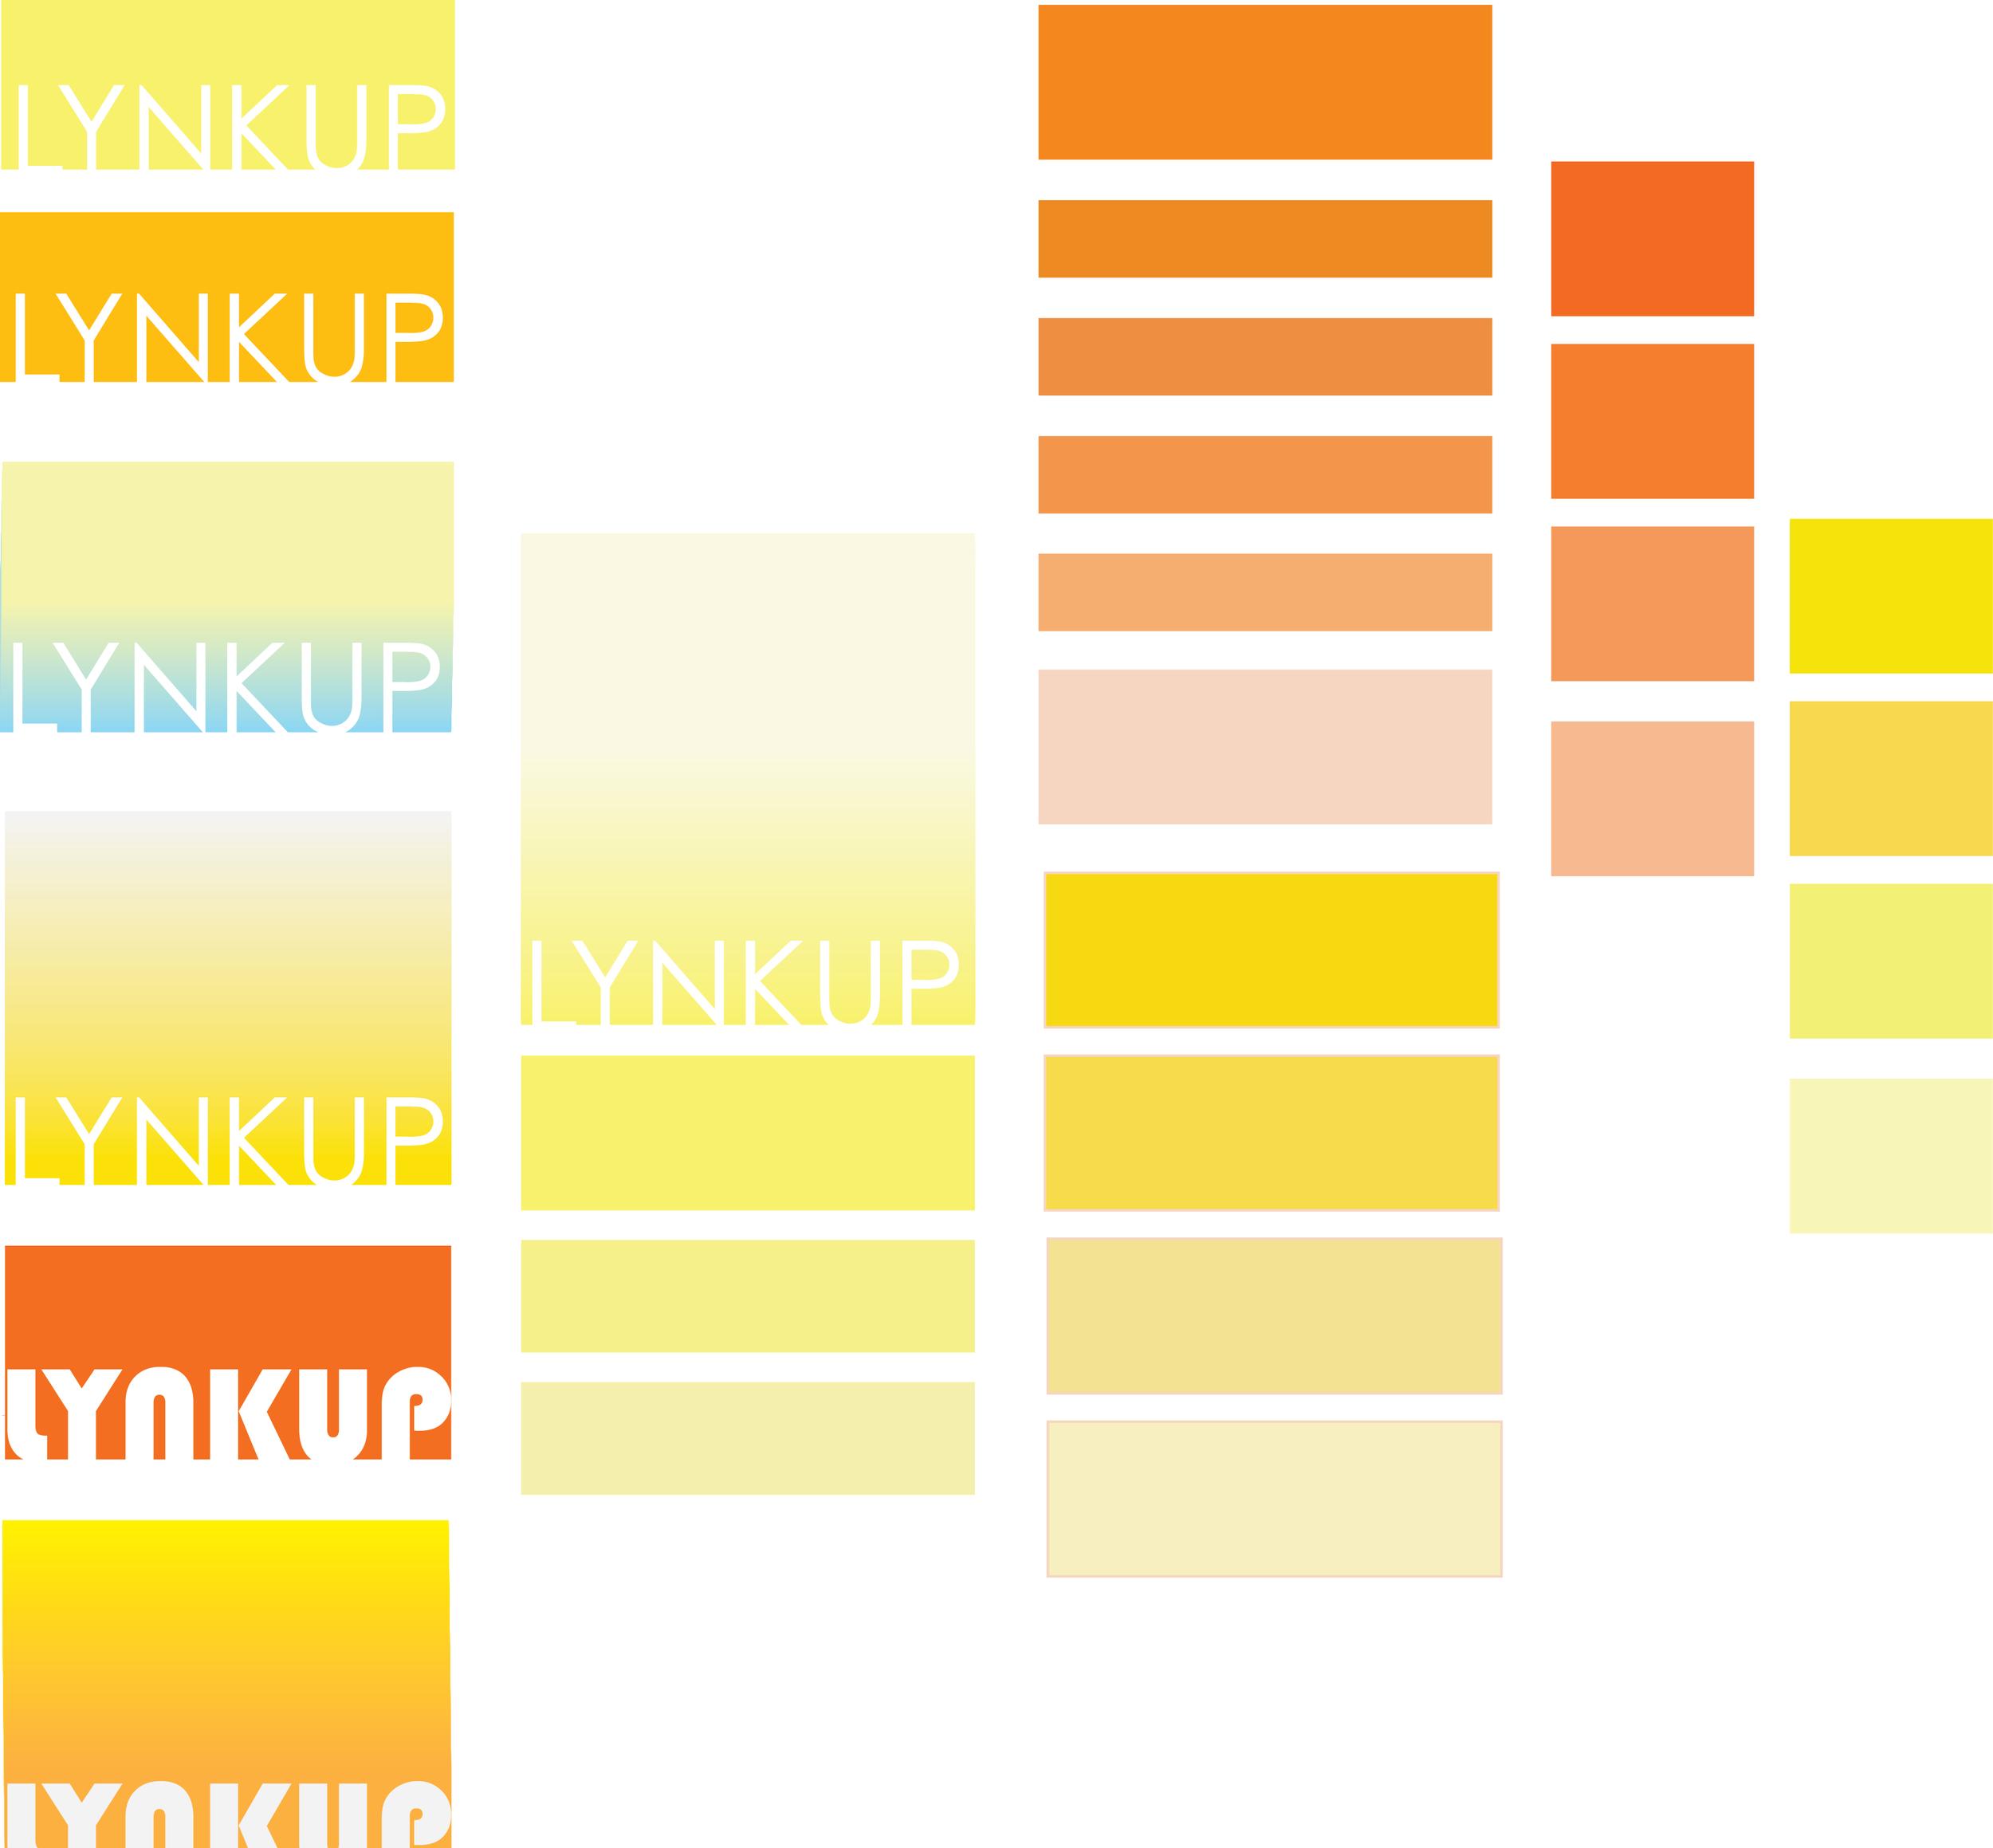 colors-LYNKUP.png